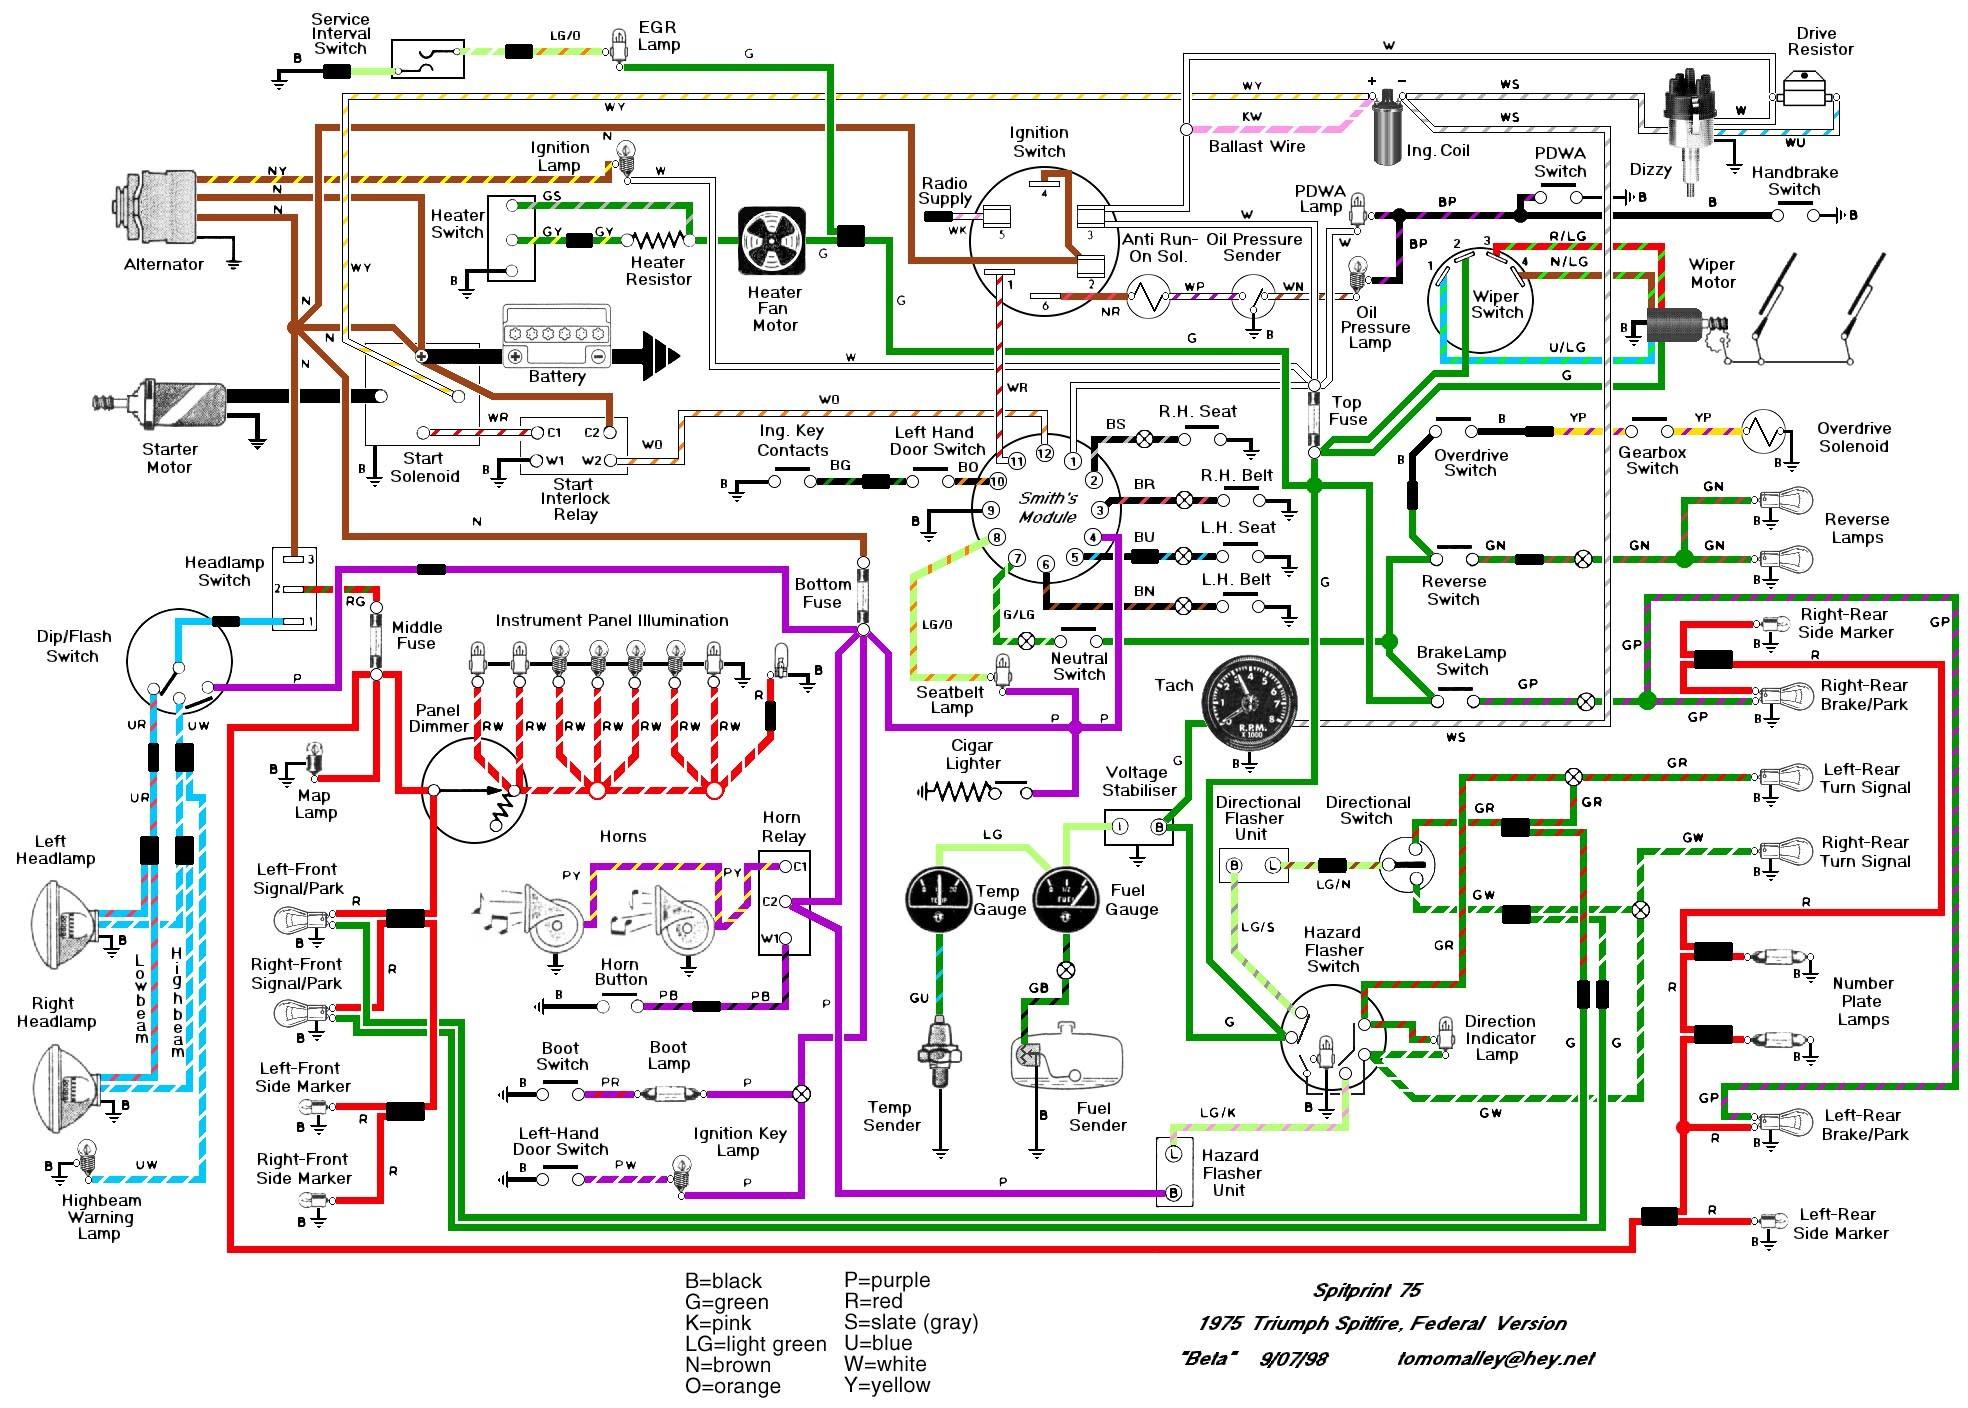 Moto Mirror Wiring Diagram Starting Know About Monaco Diagrams Hecho Detailed Schematics Rh Jvpacks Com